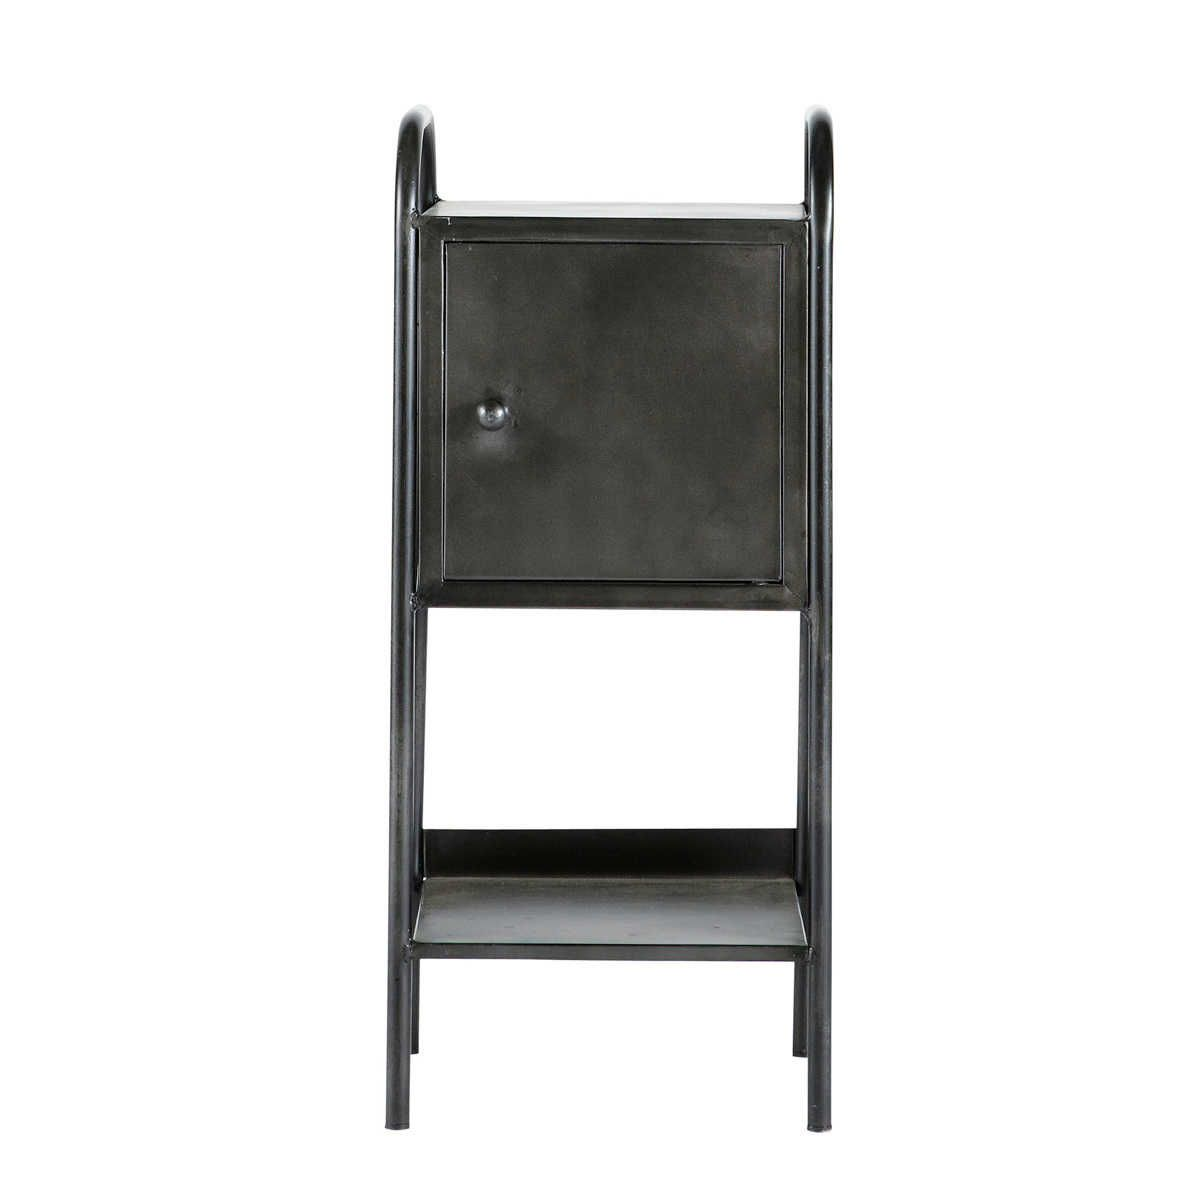 zwart indus nachtkastje edison maisons du monde pinterest chevet maison du monde et le. Black Bedroom Furniture Sets. Home Design Ideas